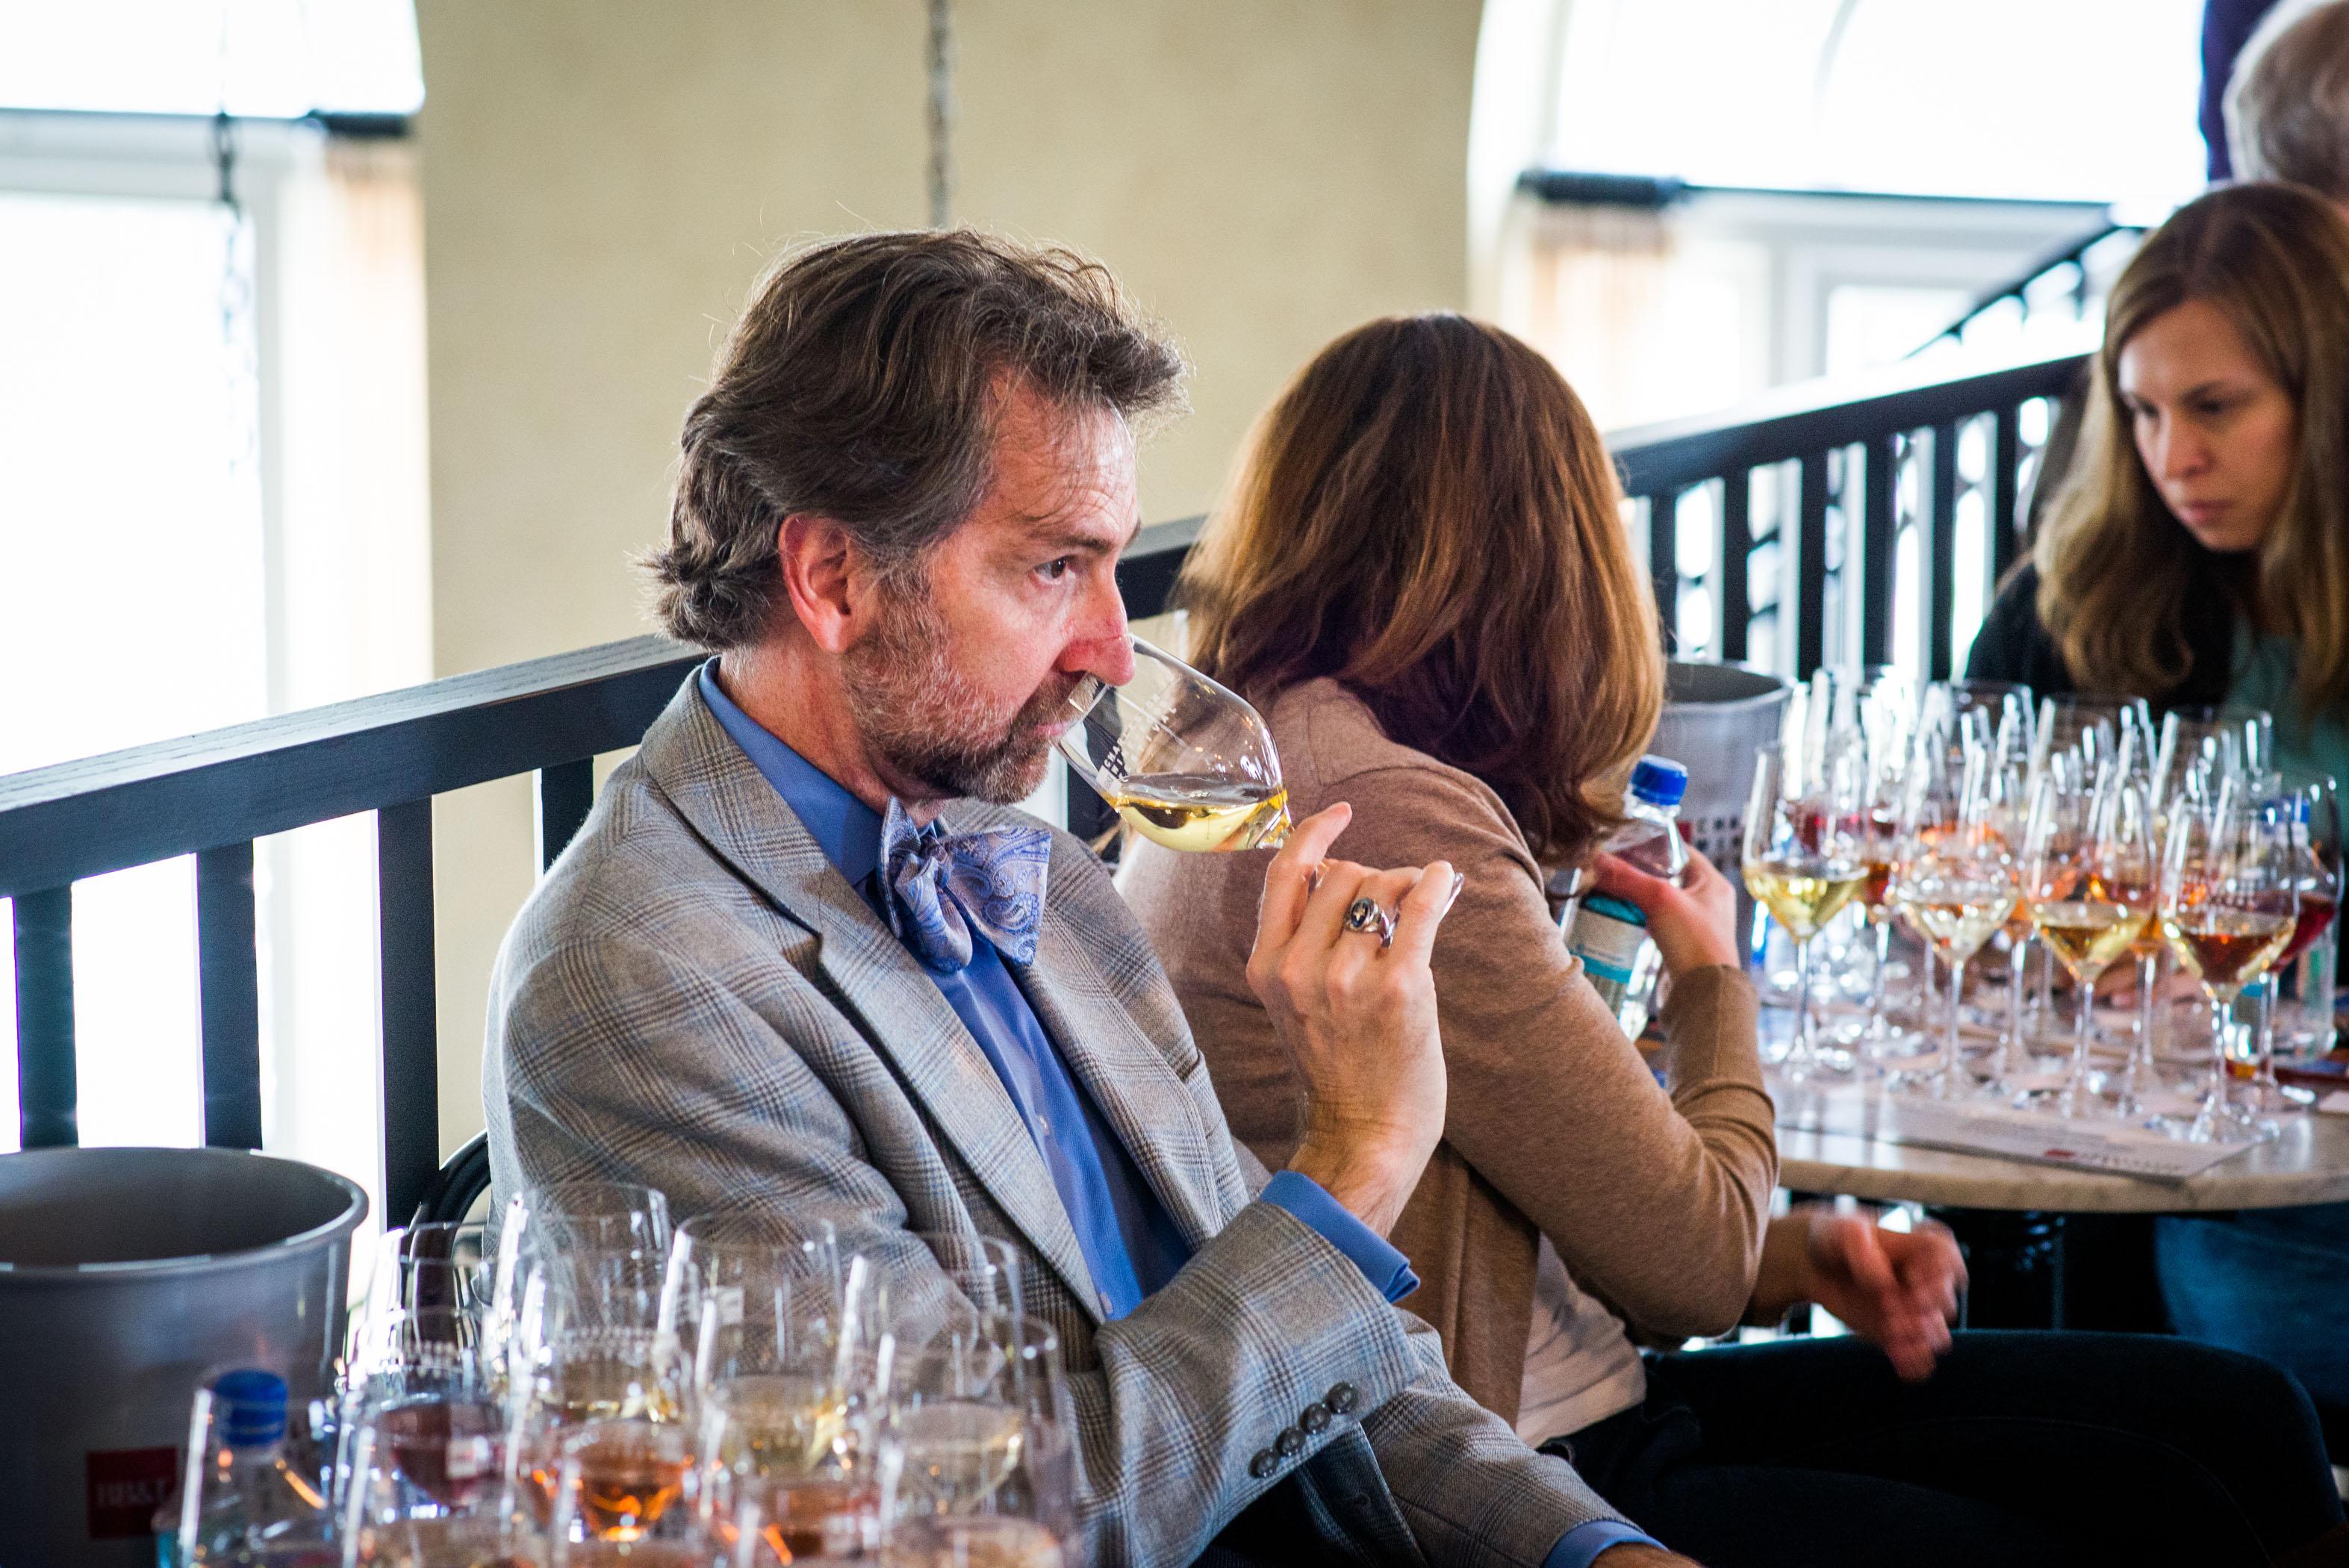 Guest Tastes Wine Image